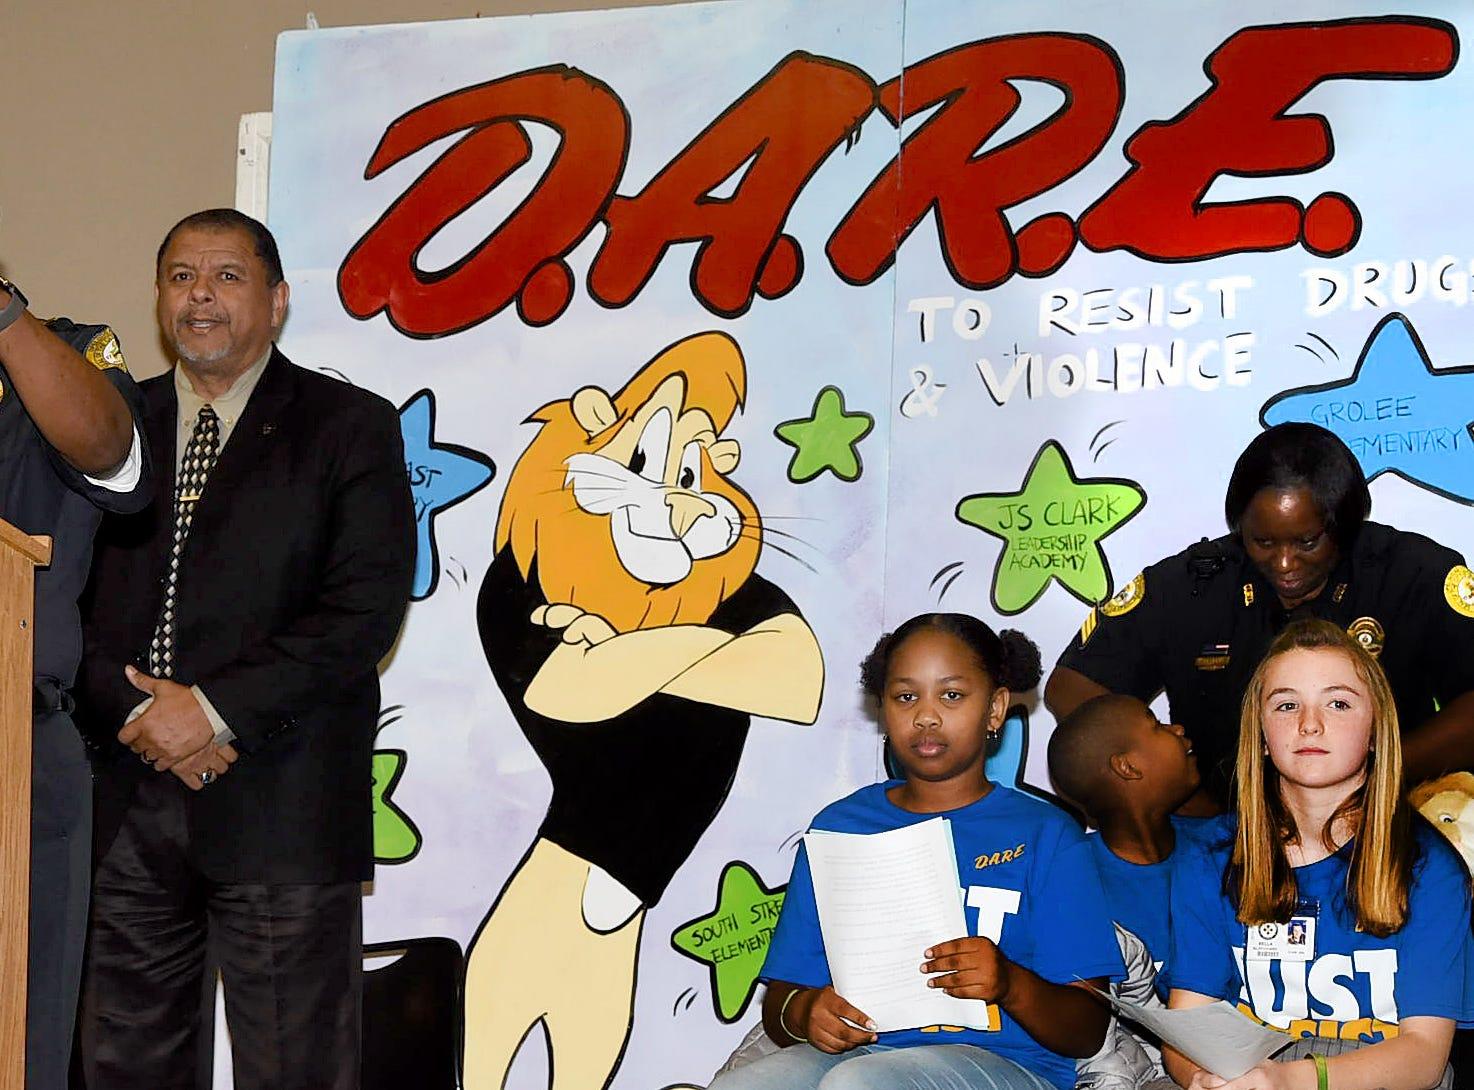 Citywide DARE graduation ceremonyl held Friday in Opelousas